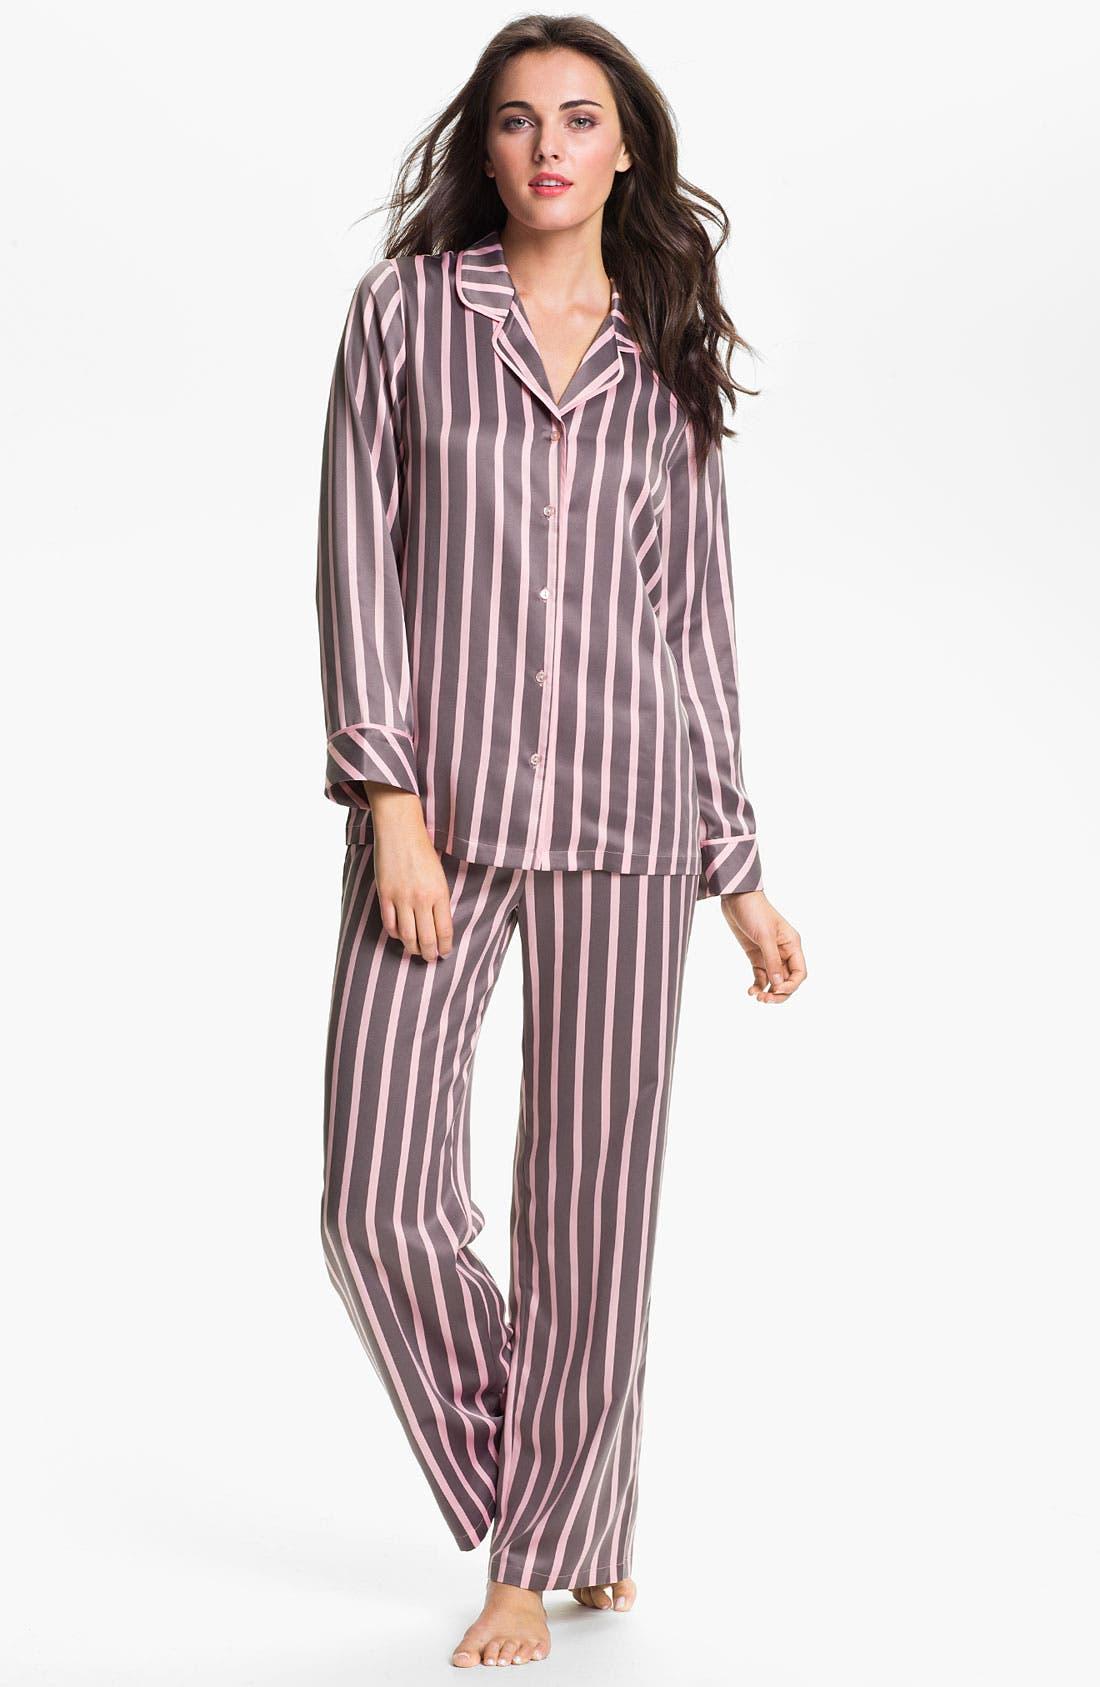 Alternate Image 1 Selected - Nordstrom 'Glam' Satin Pajamas